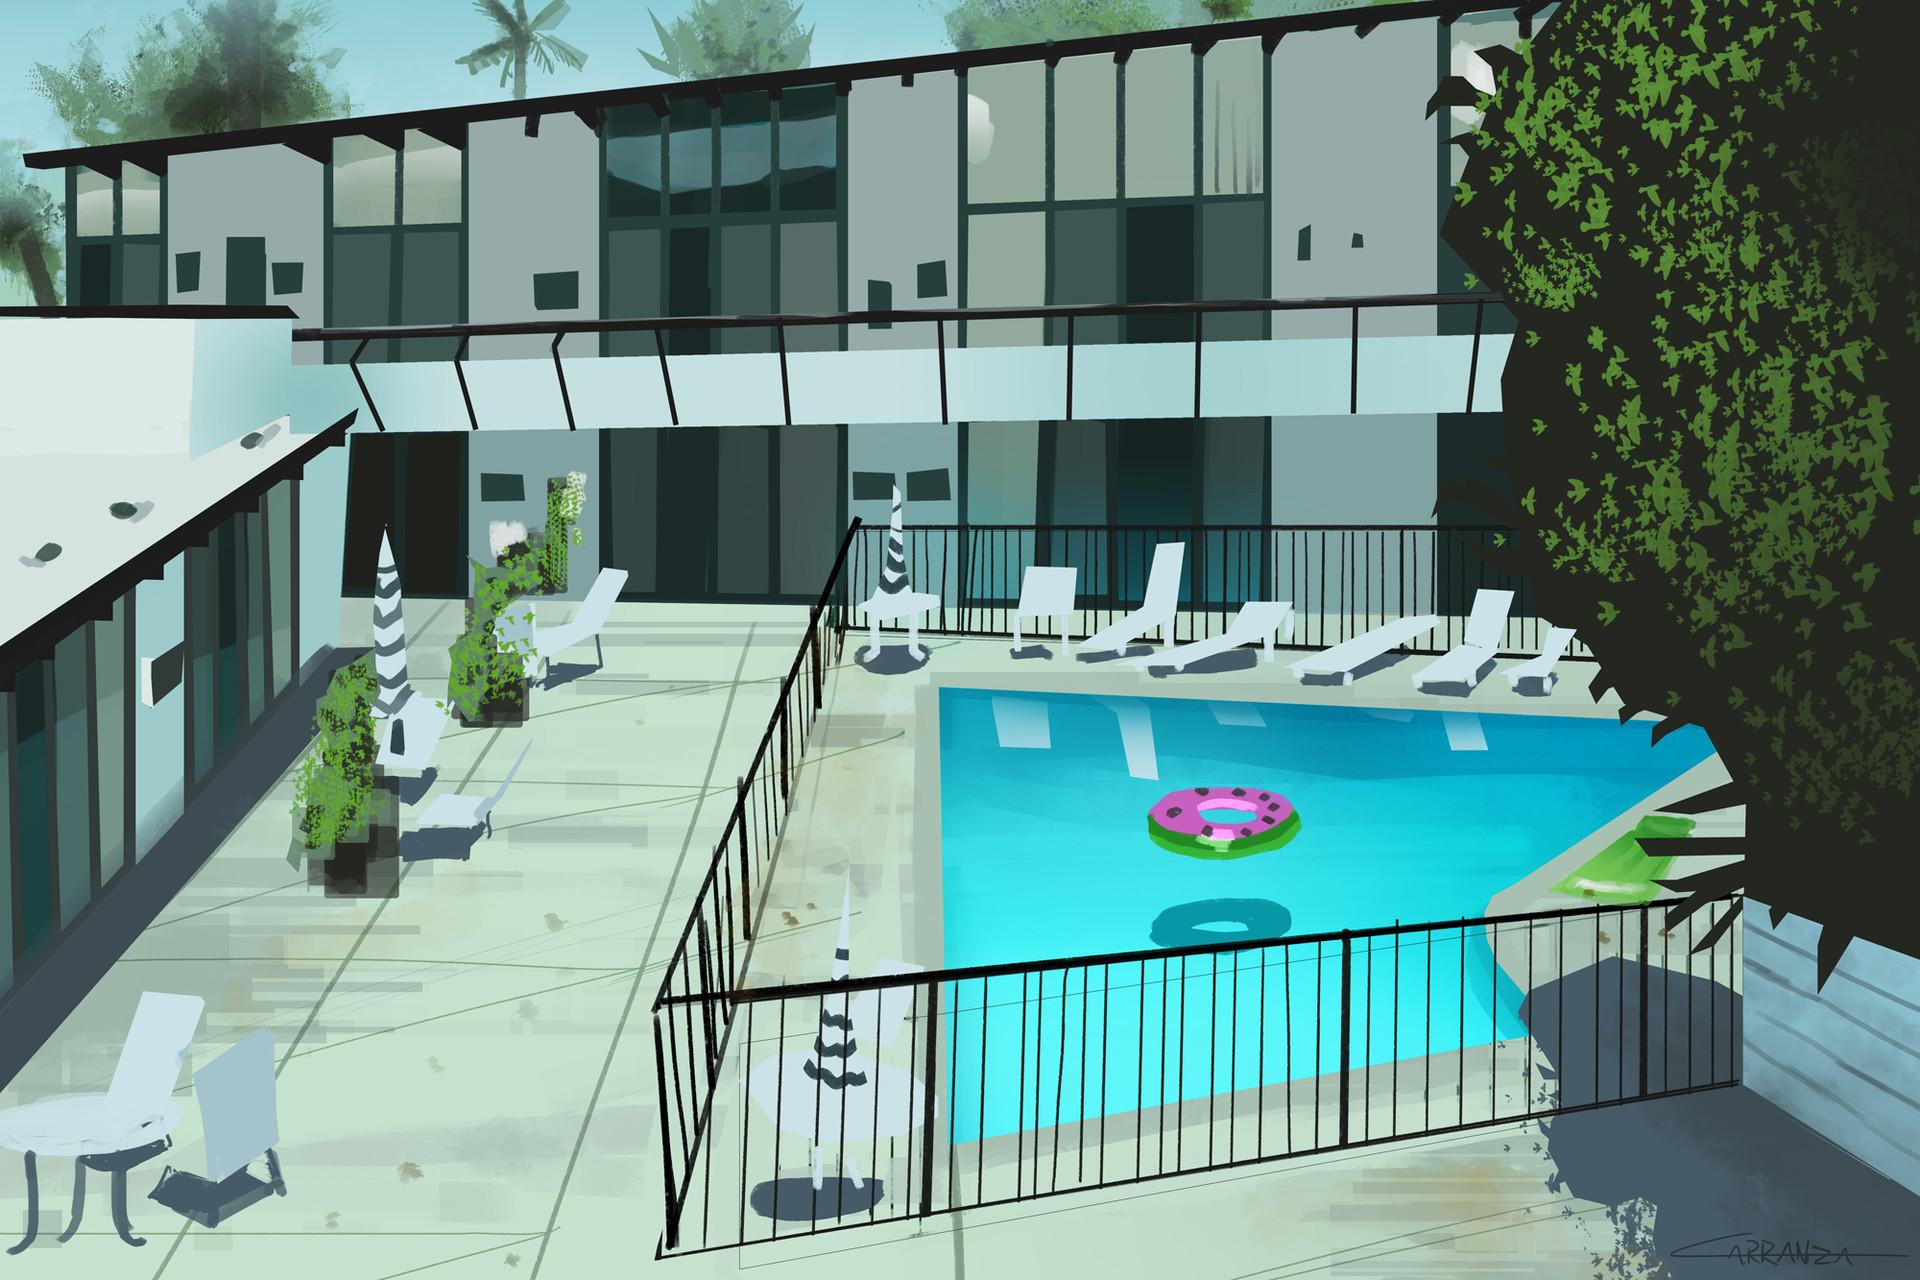 Albert carranza poolsideweb